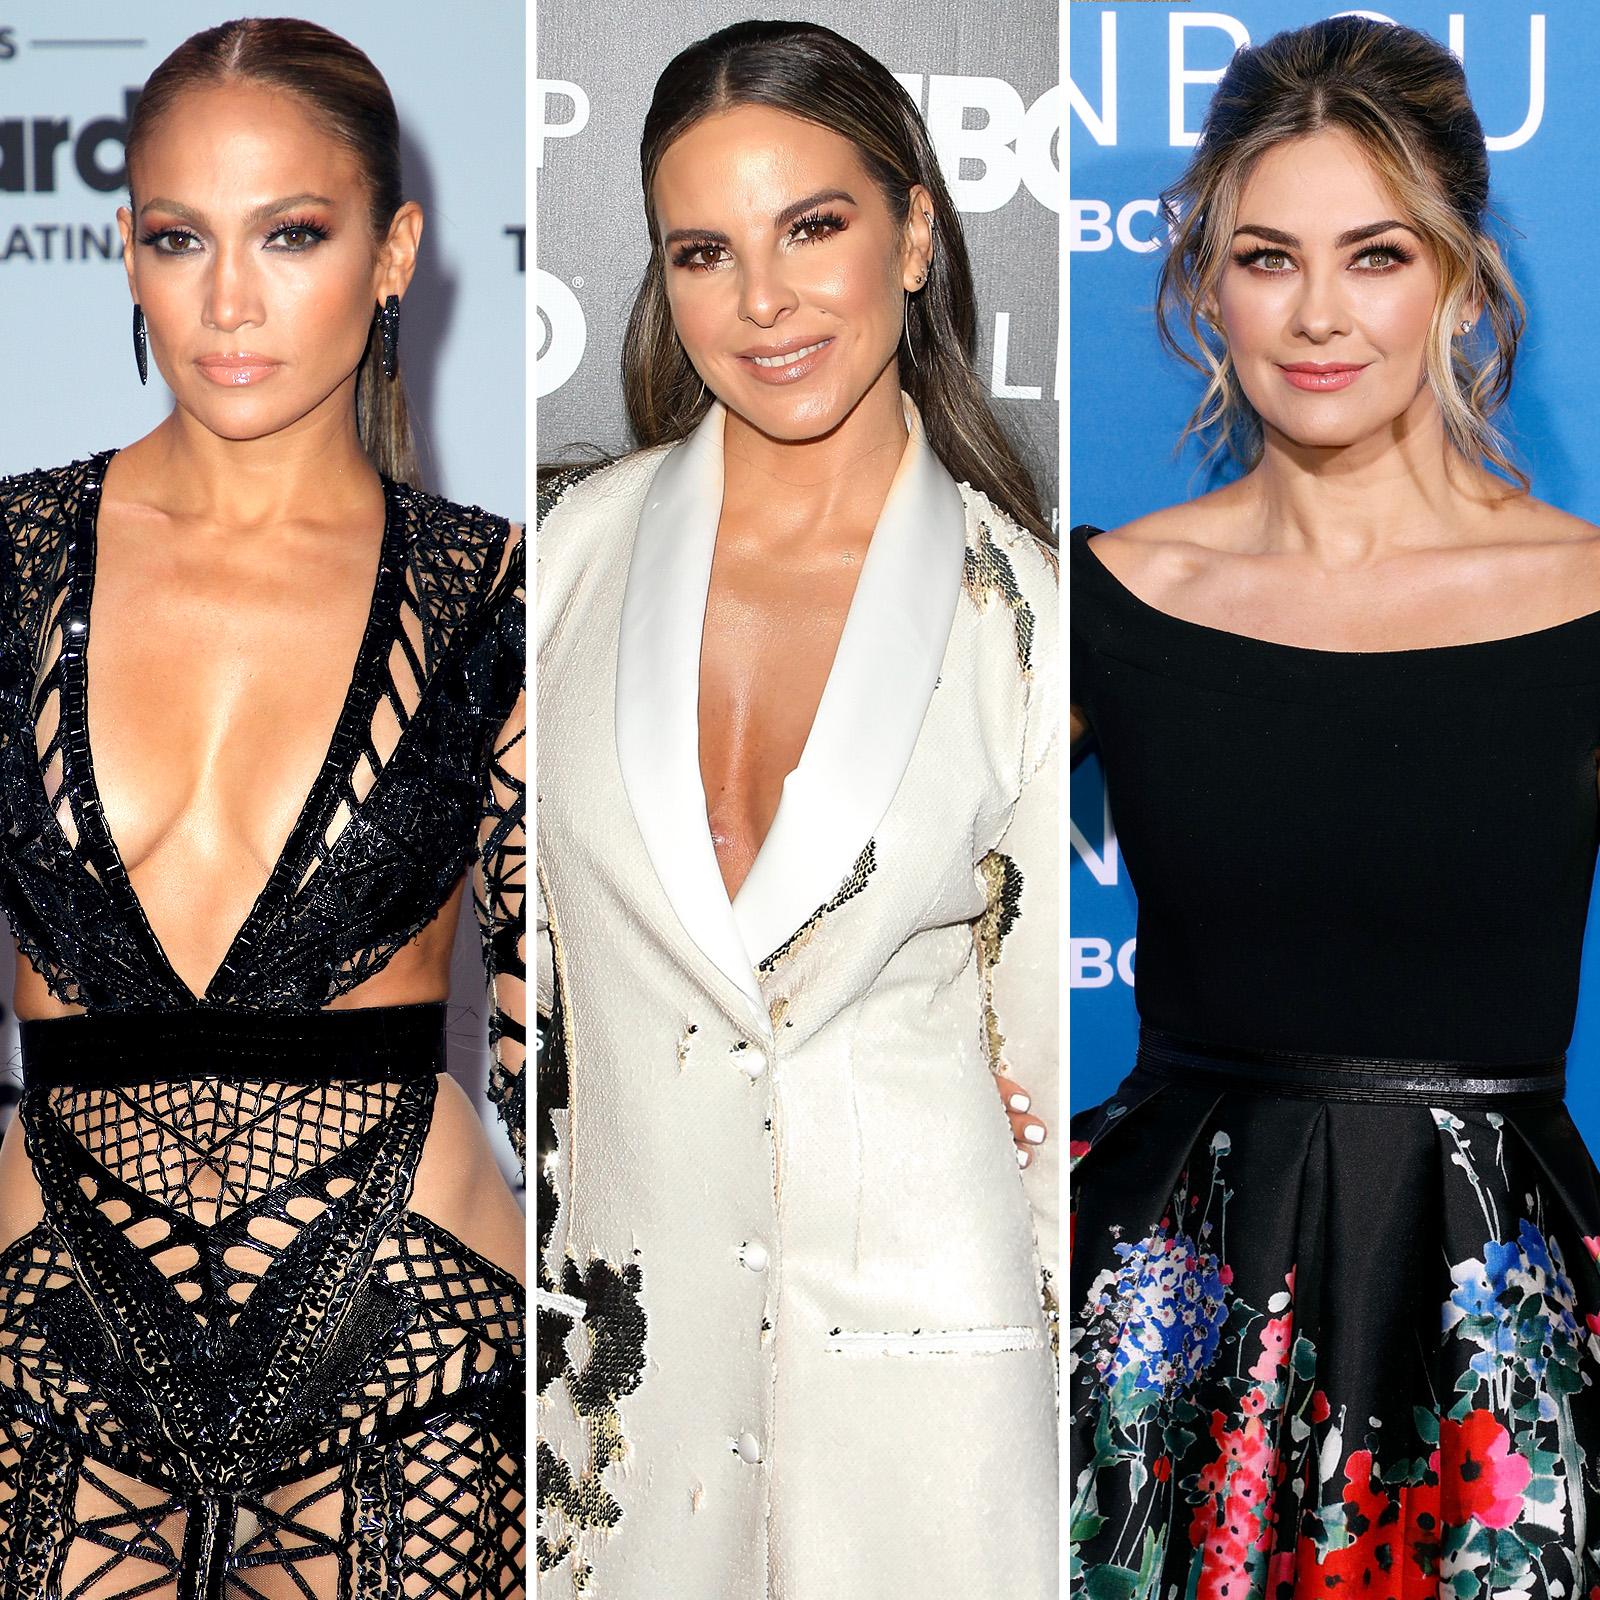 Jennifer Lopez, Kate del Castillo, Aracely Arambula